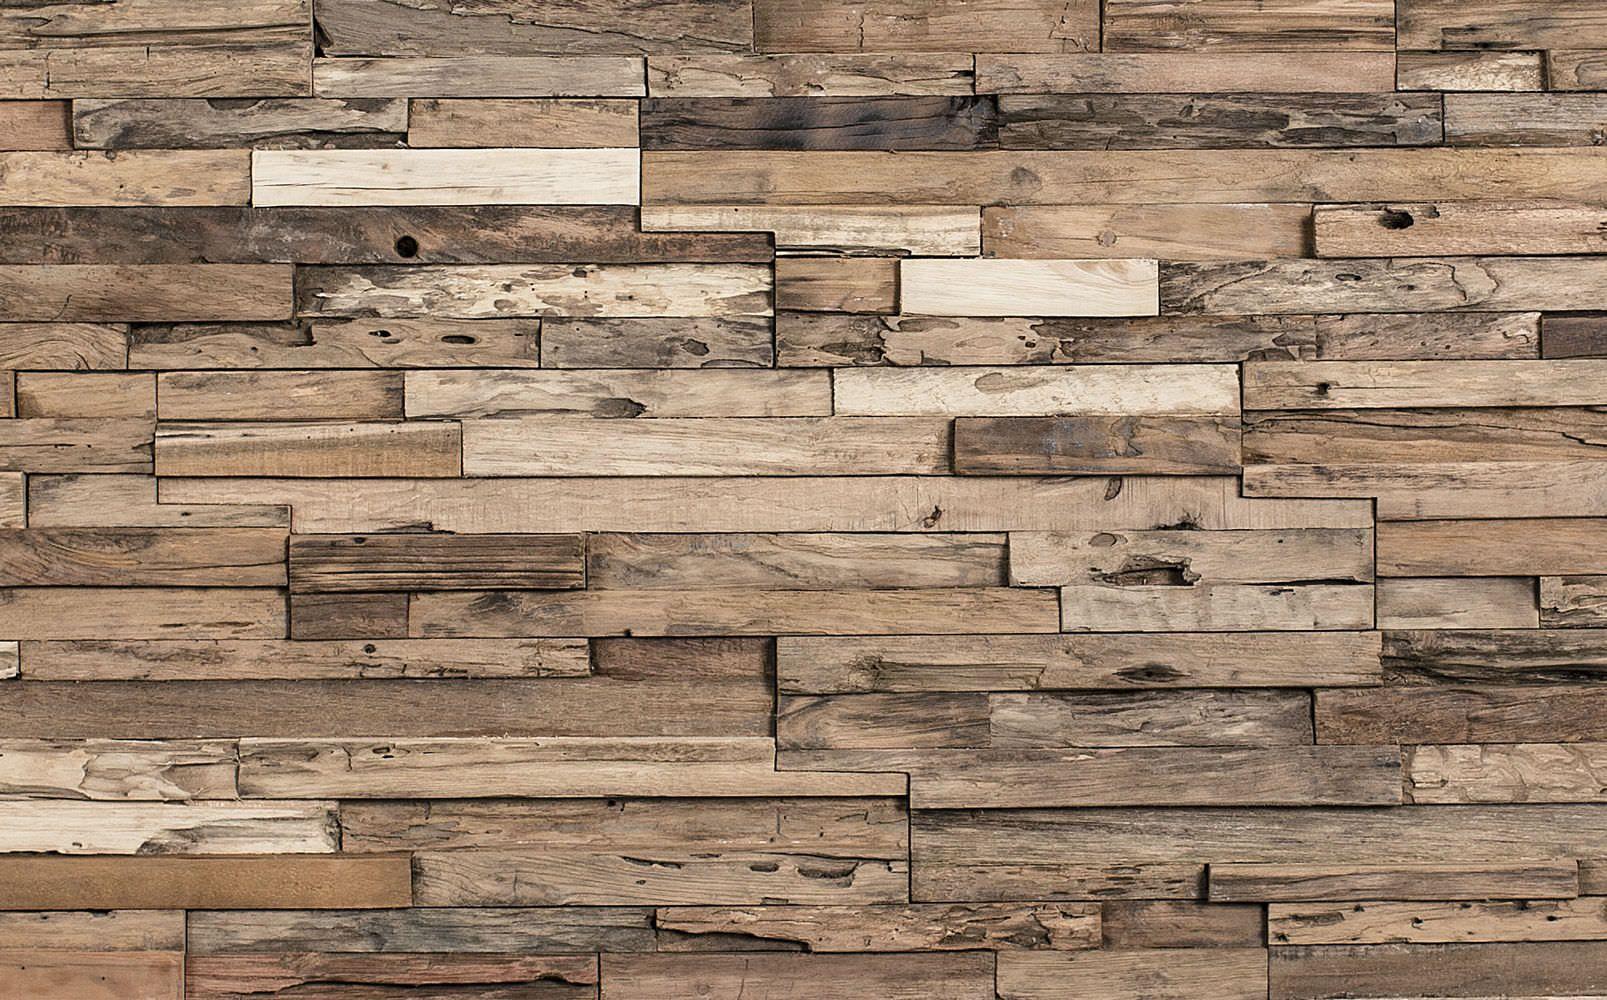 wood wall panel board cool wood wall. Wood Wall Panel Board Cool Wall. Panels Blending Old World Craftsmanship And Contemporary